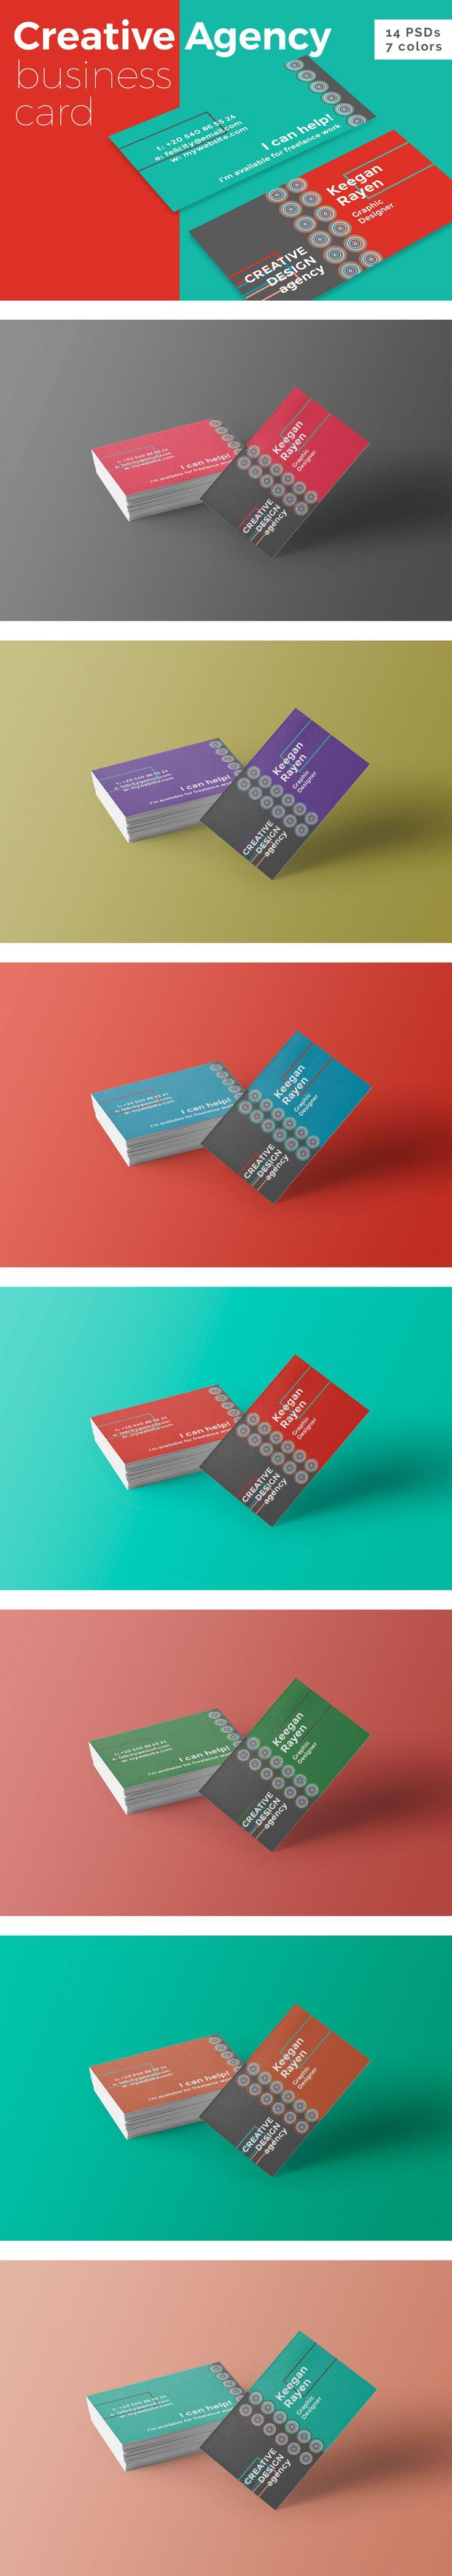 Creative Design Agency Business Card